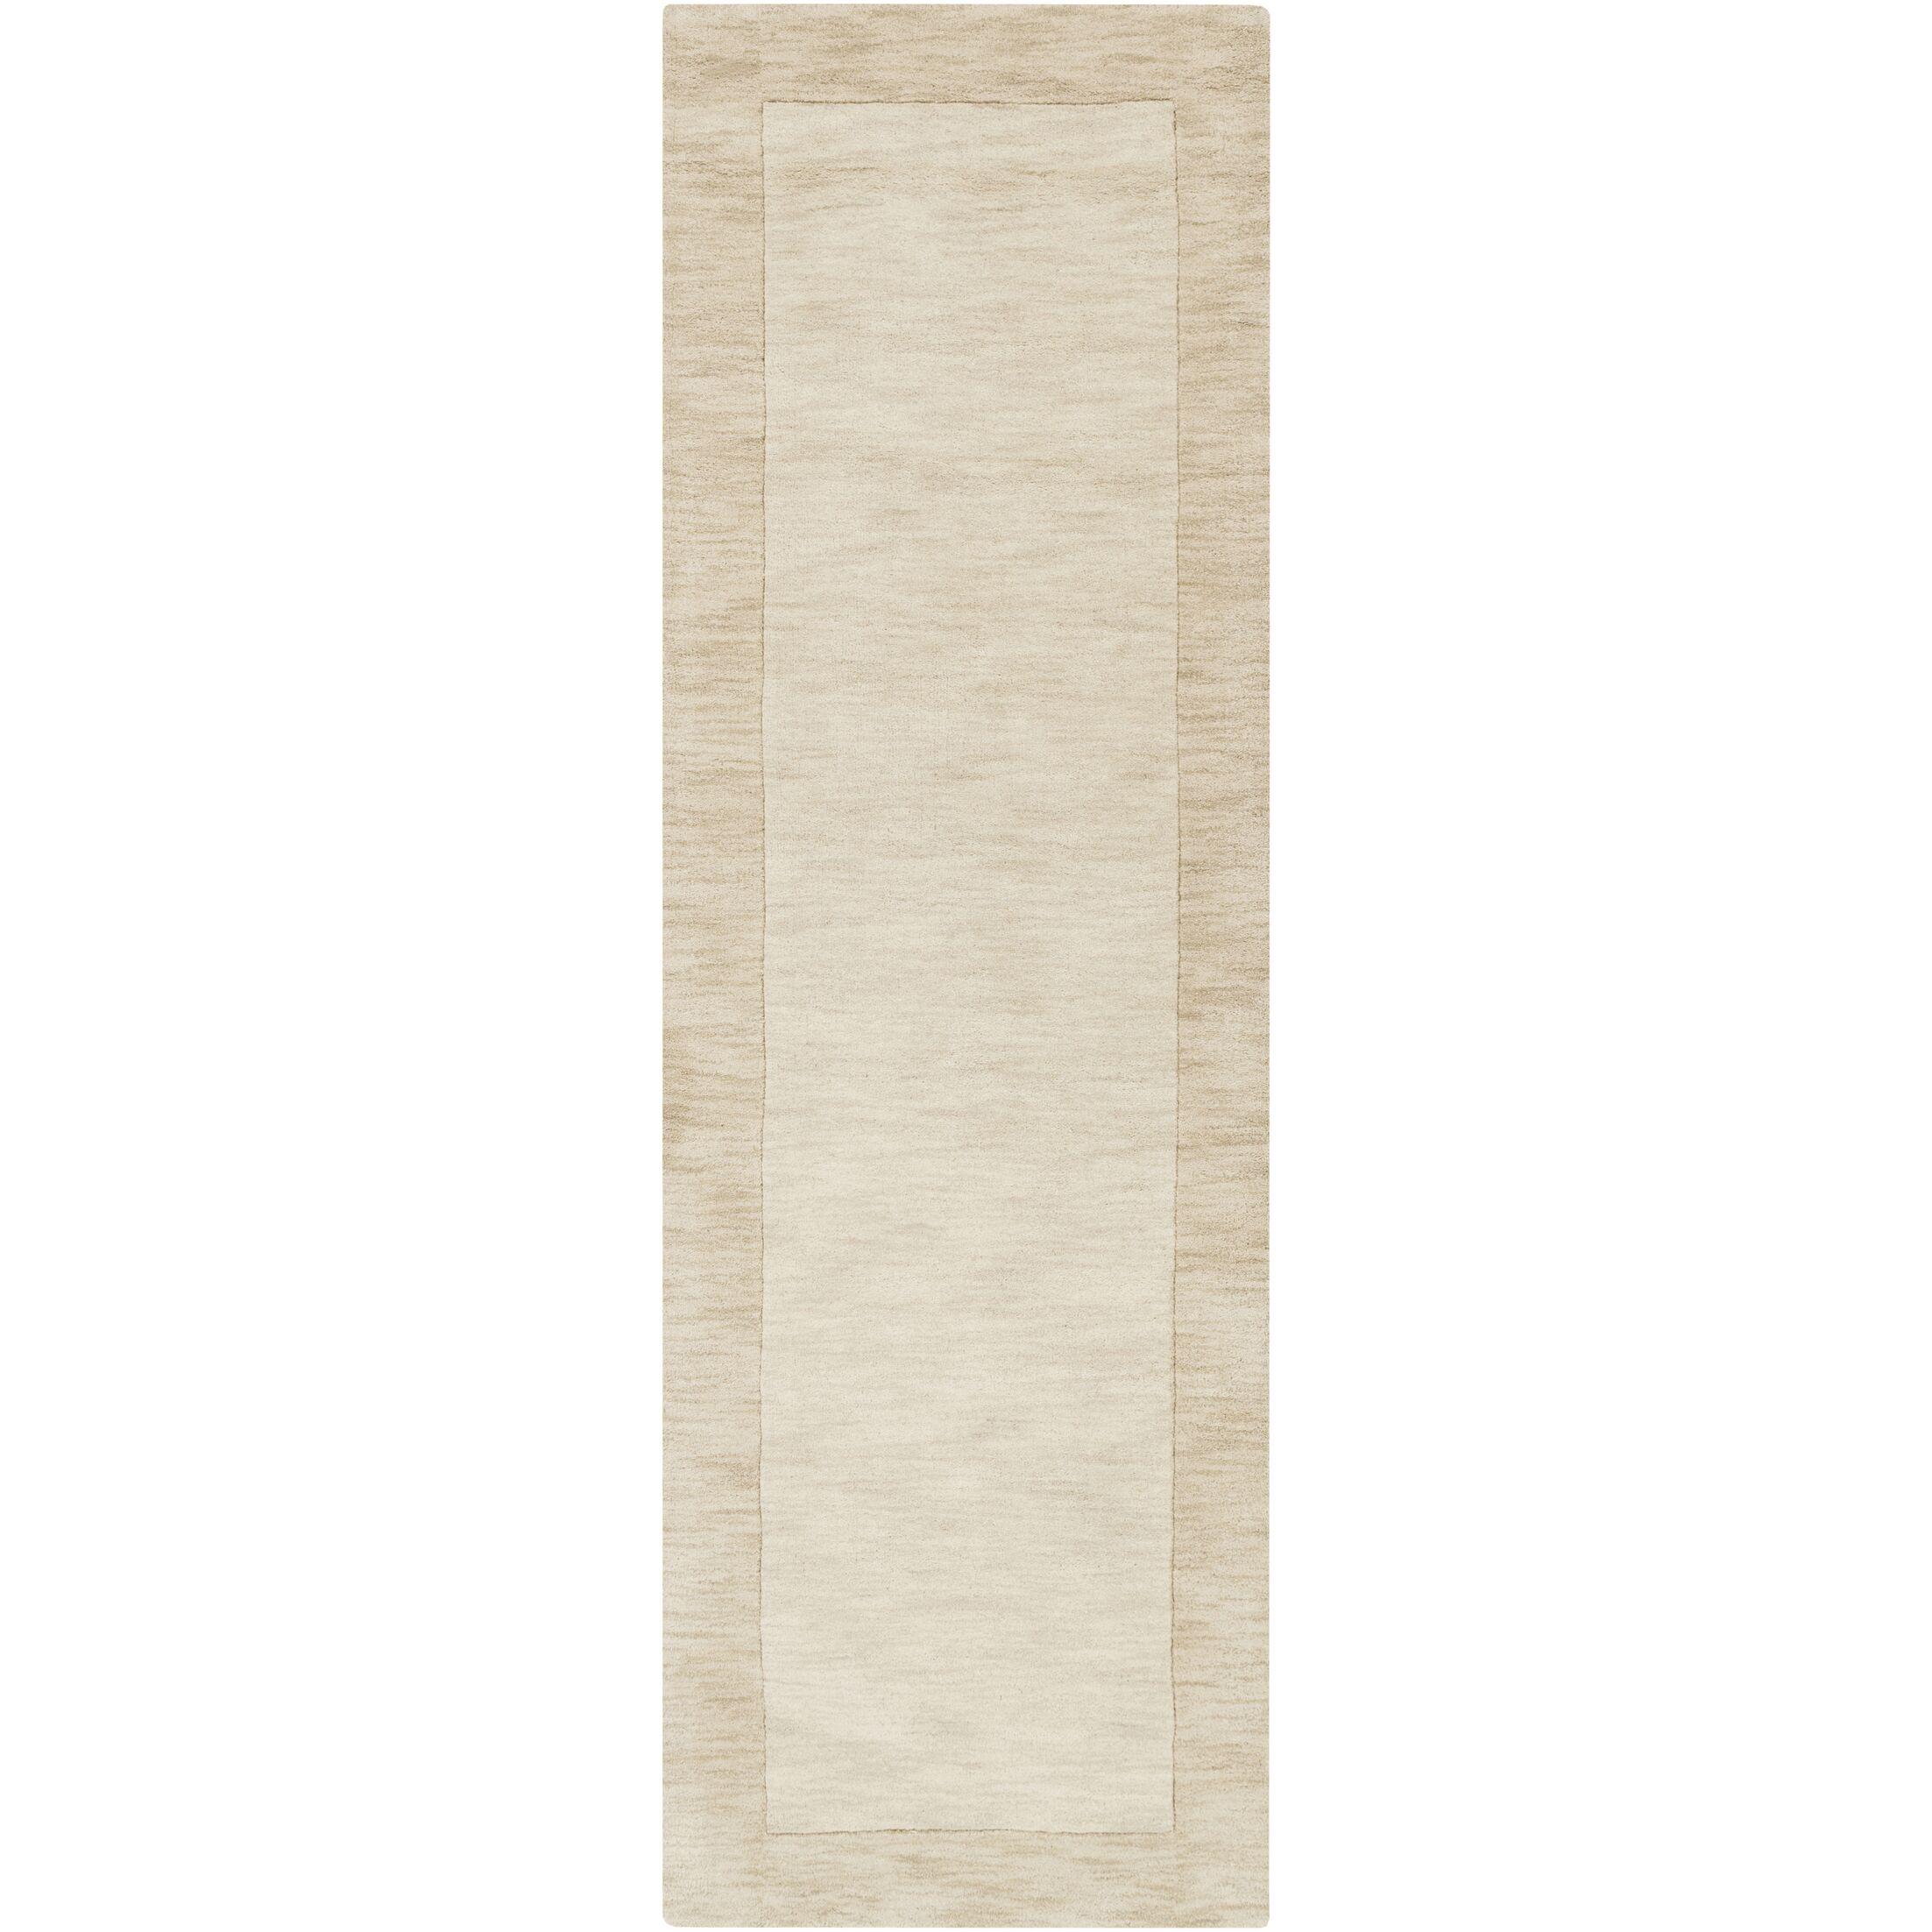 Bradley Hand-Woven Beige Solid Area Rug Rug Size: Runner 2'6